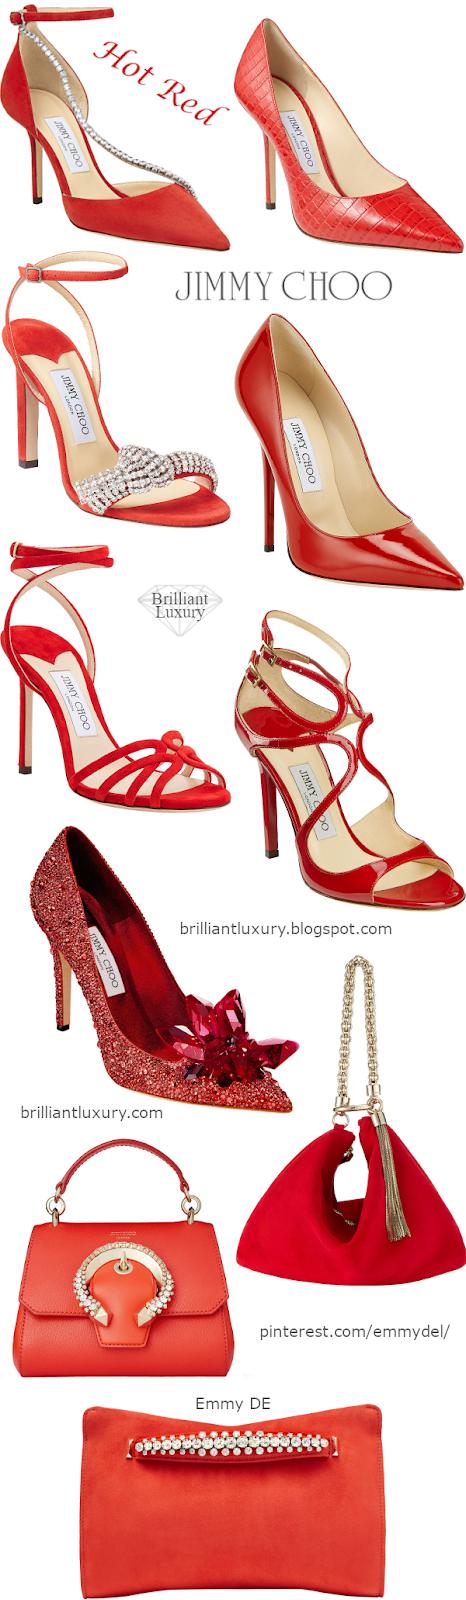 Jimmy Choo Hot Red Shoes & Bags #brilliantluxury